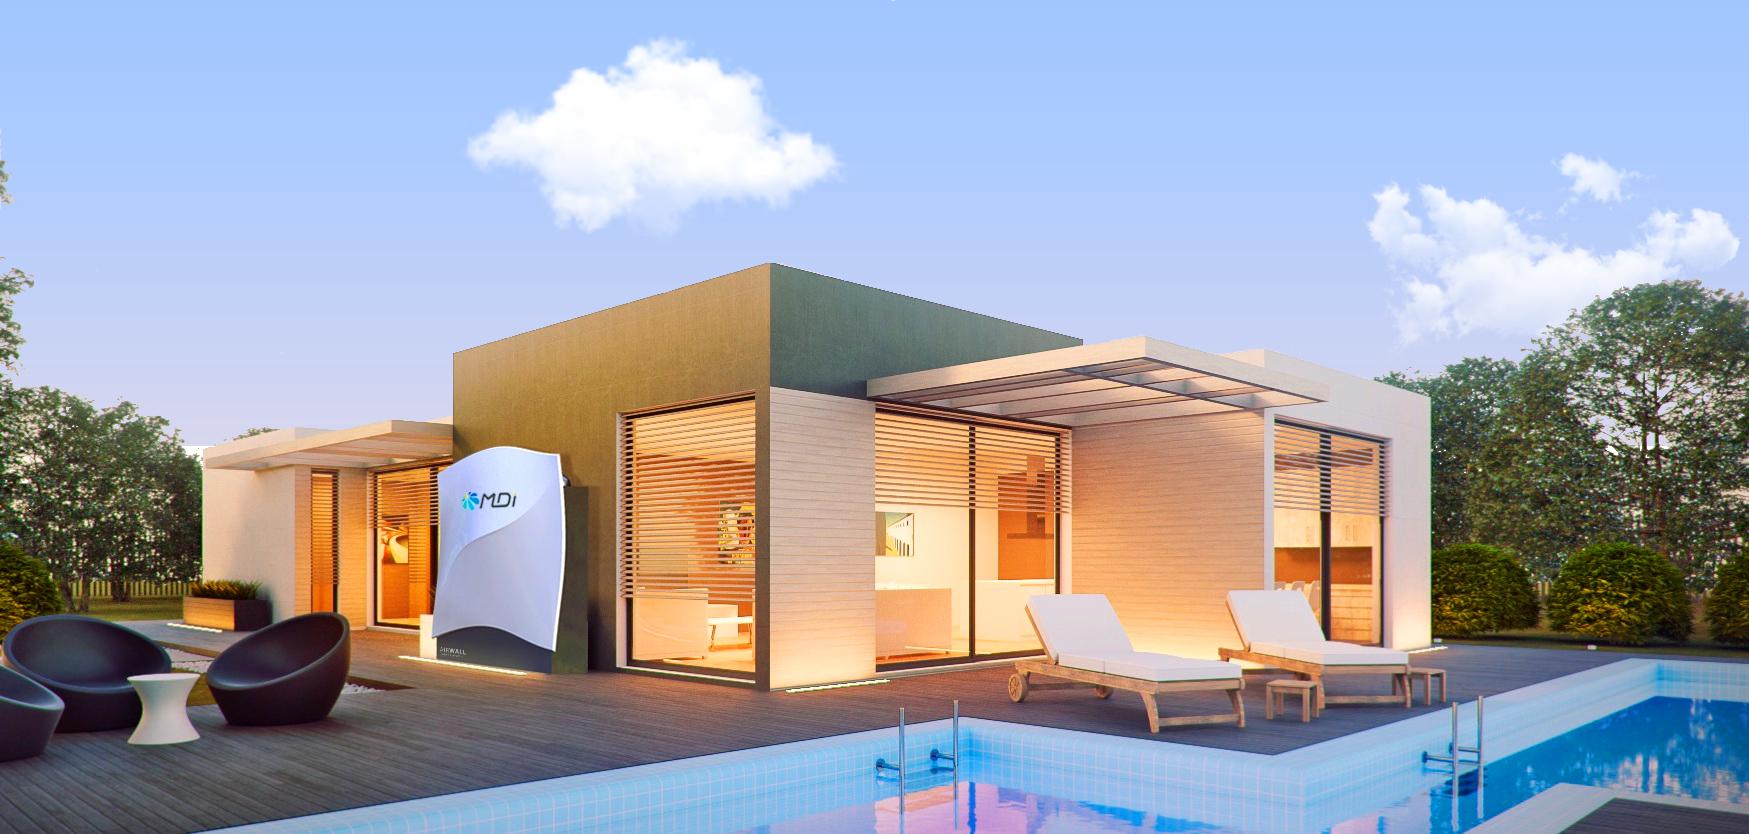 AirWall maison - Photo 3 copy.jpg